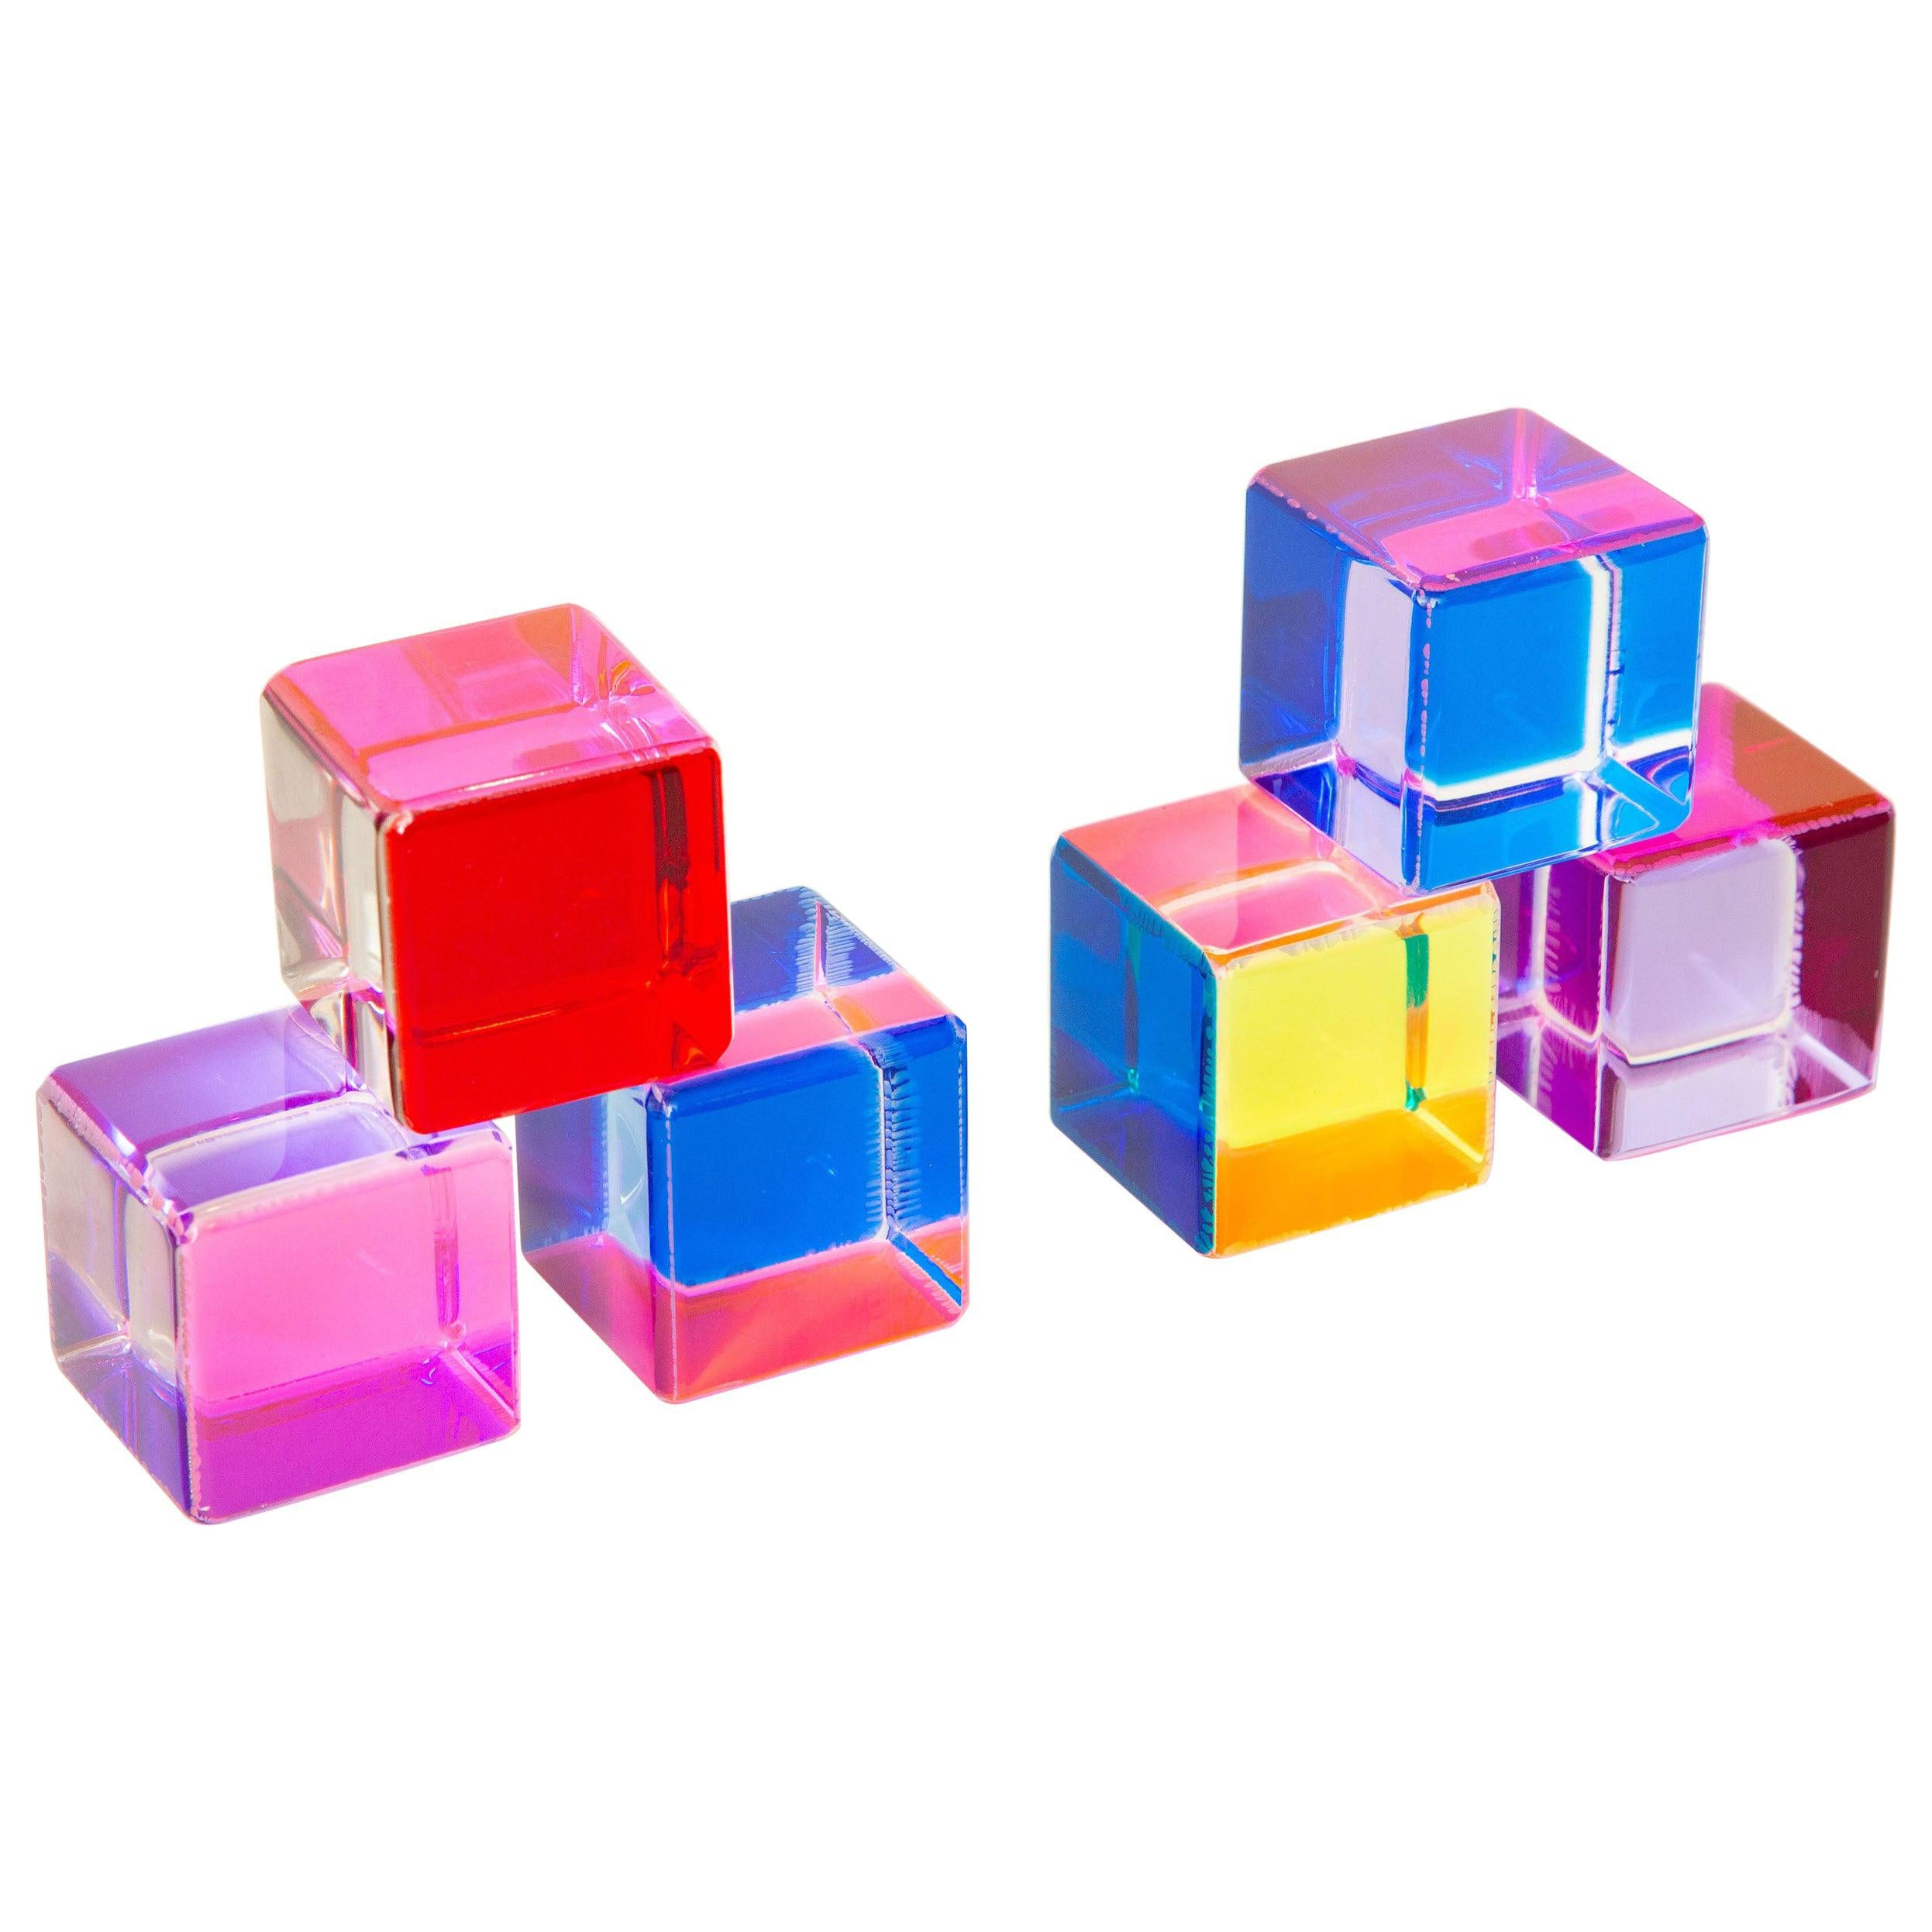 Six Colored Vasa Attributed Laminated Lucite Cube Sculptures